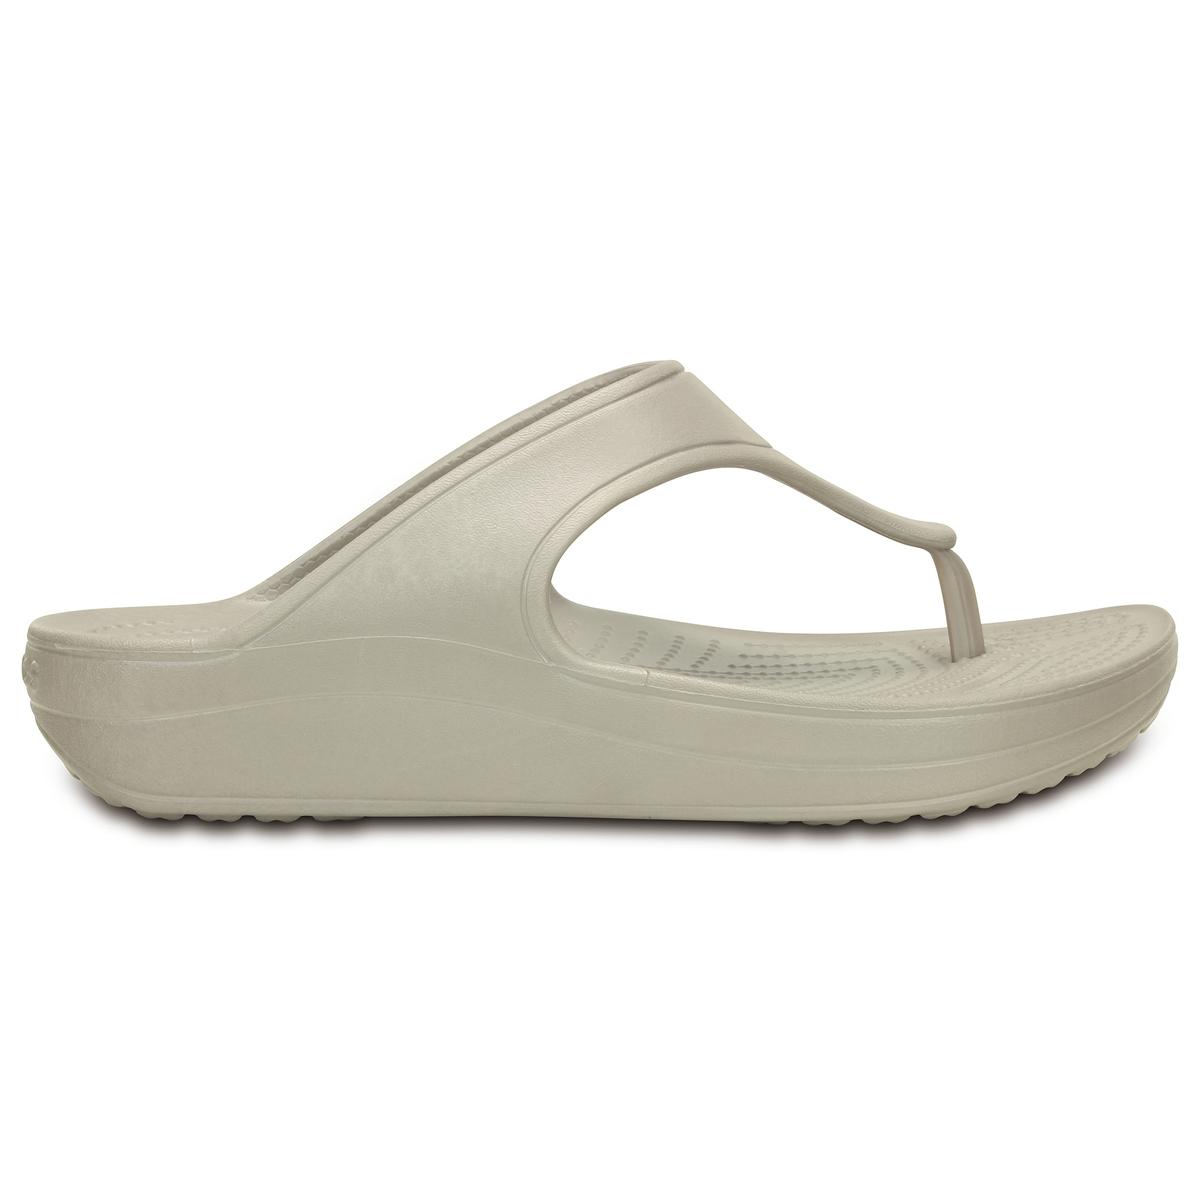 Вьетнамки на танкетке Sloane Platform Flip nemaone new fashion open toe high heels slippers summer women sandals platform flip flops beach shoes large size 43